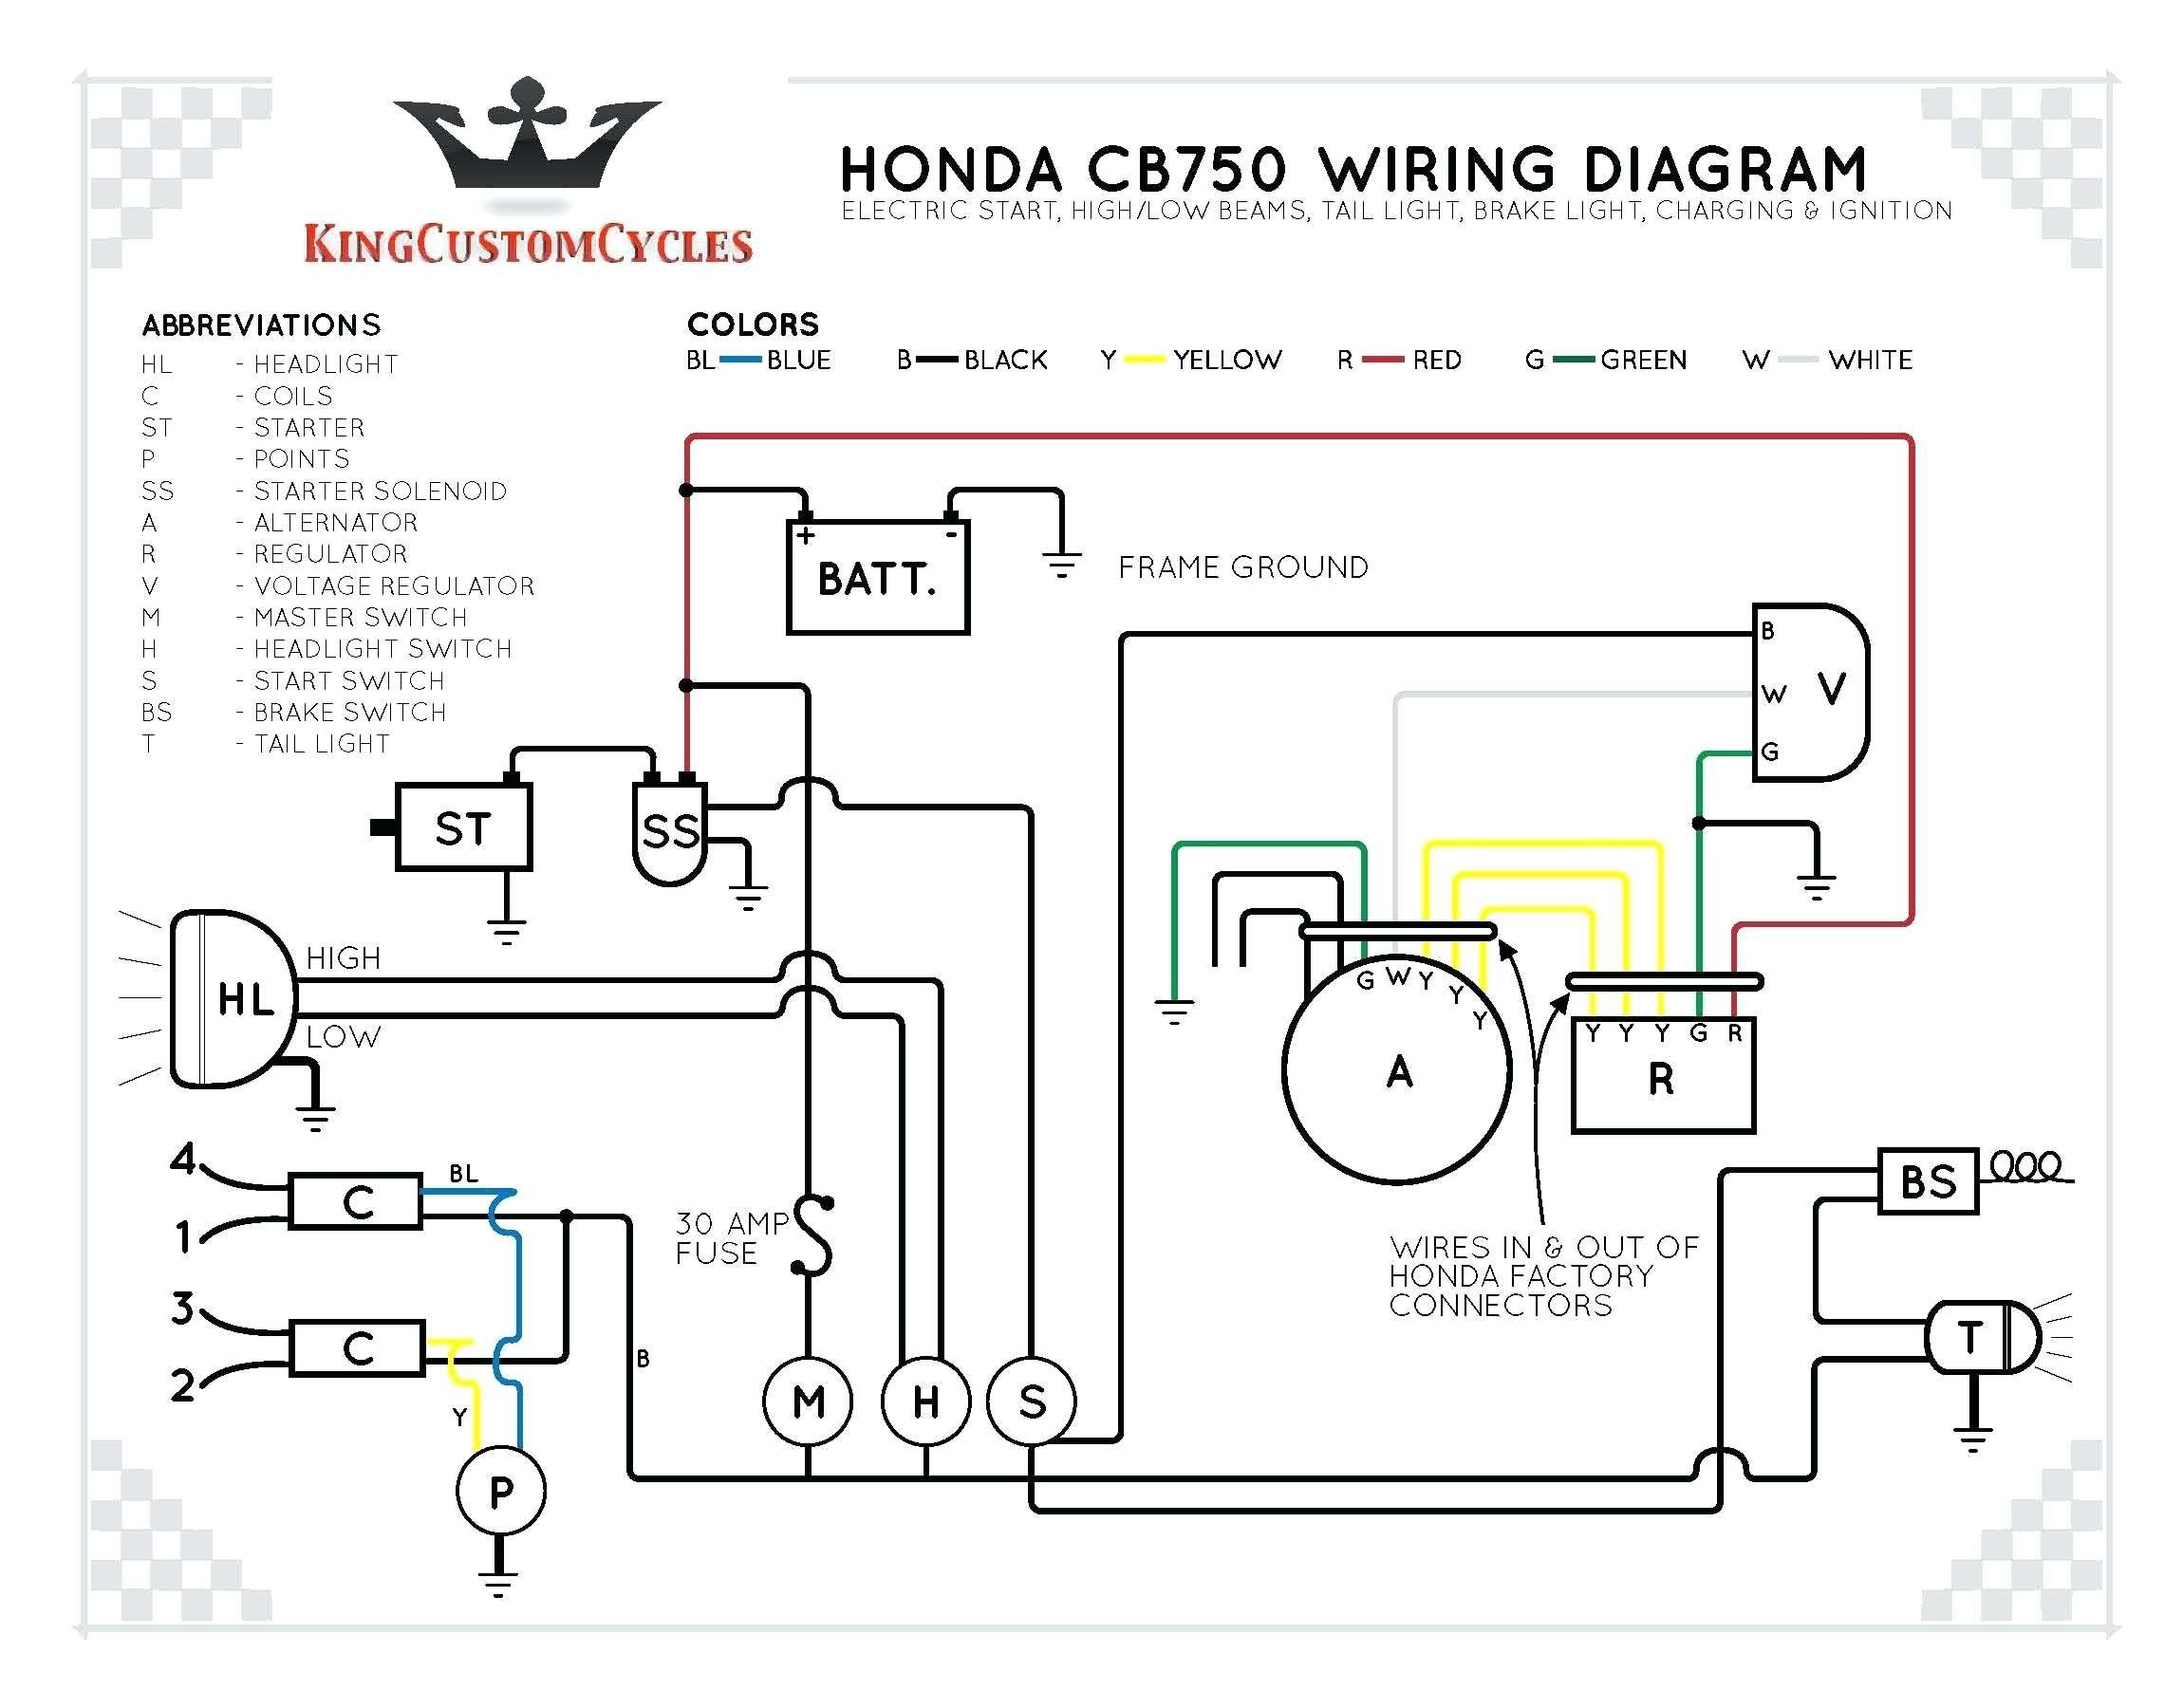 Harley Davidson Softail Wiring Diagram Coil. . Wiring Diagram on